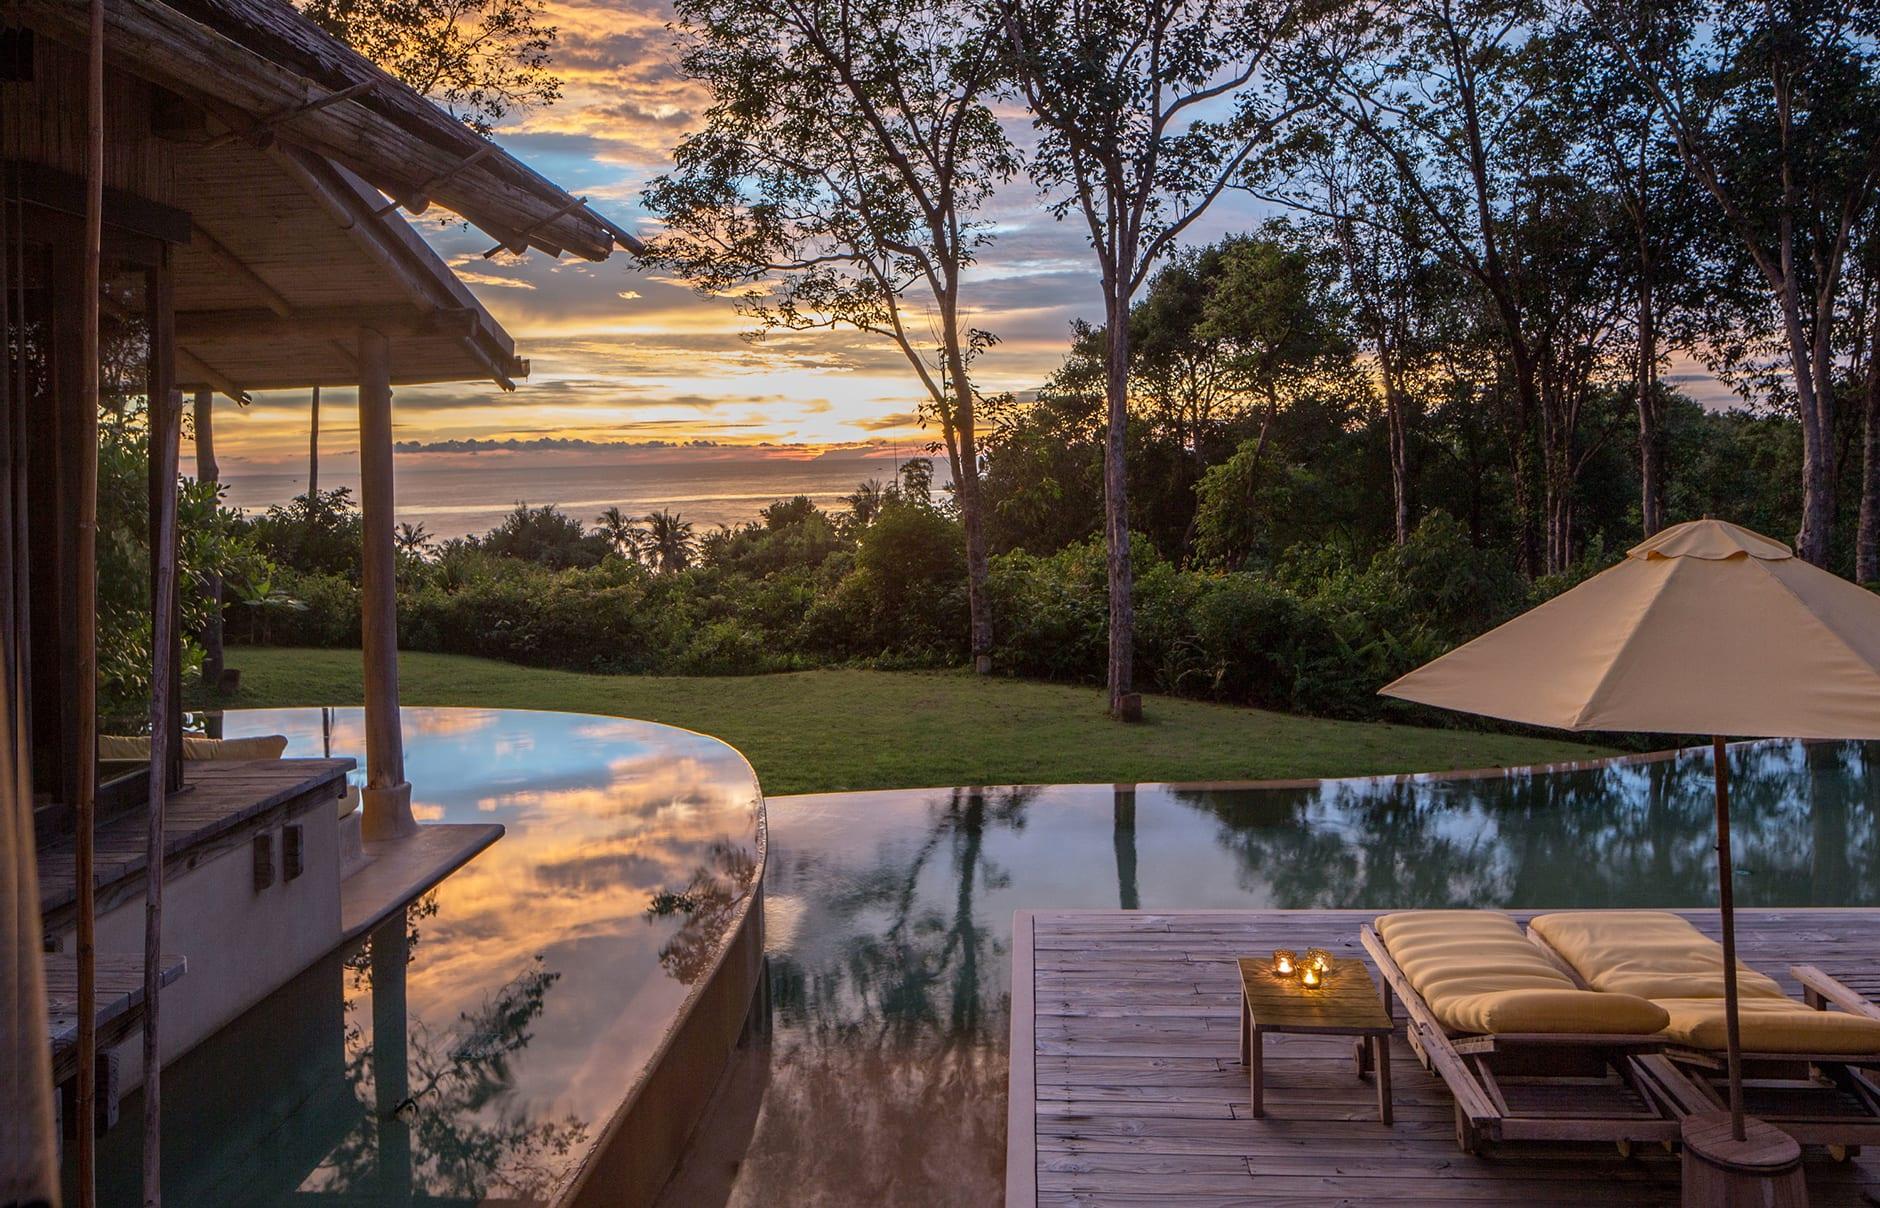 Soneva Kiri, Koh Kood, Thailand. Luxury Hotel Review by TravelPlusStyle. Photo © Soneva